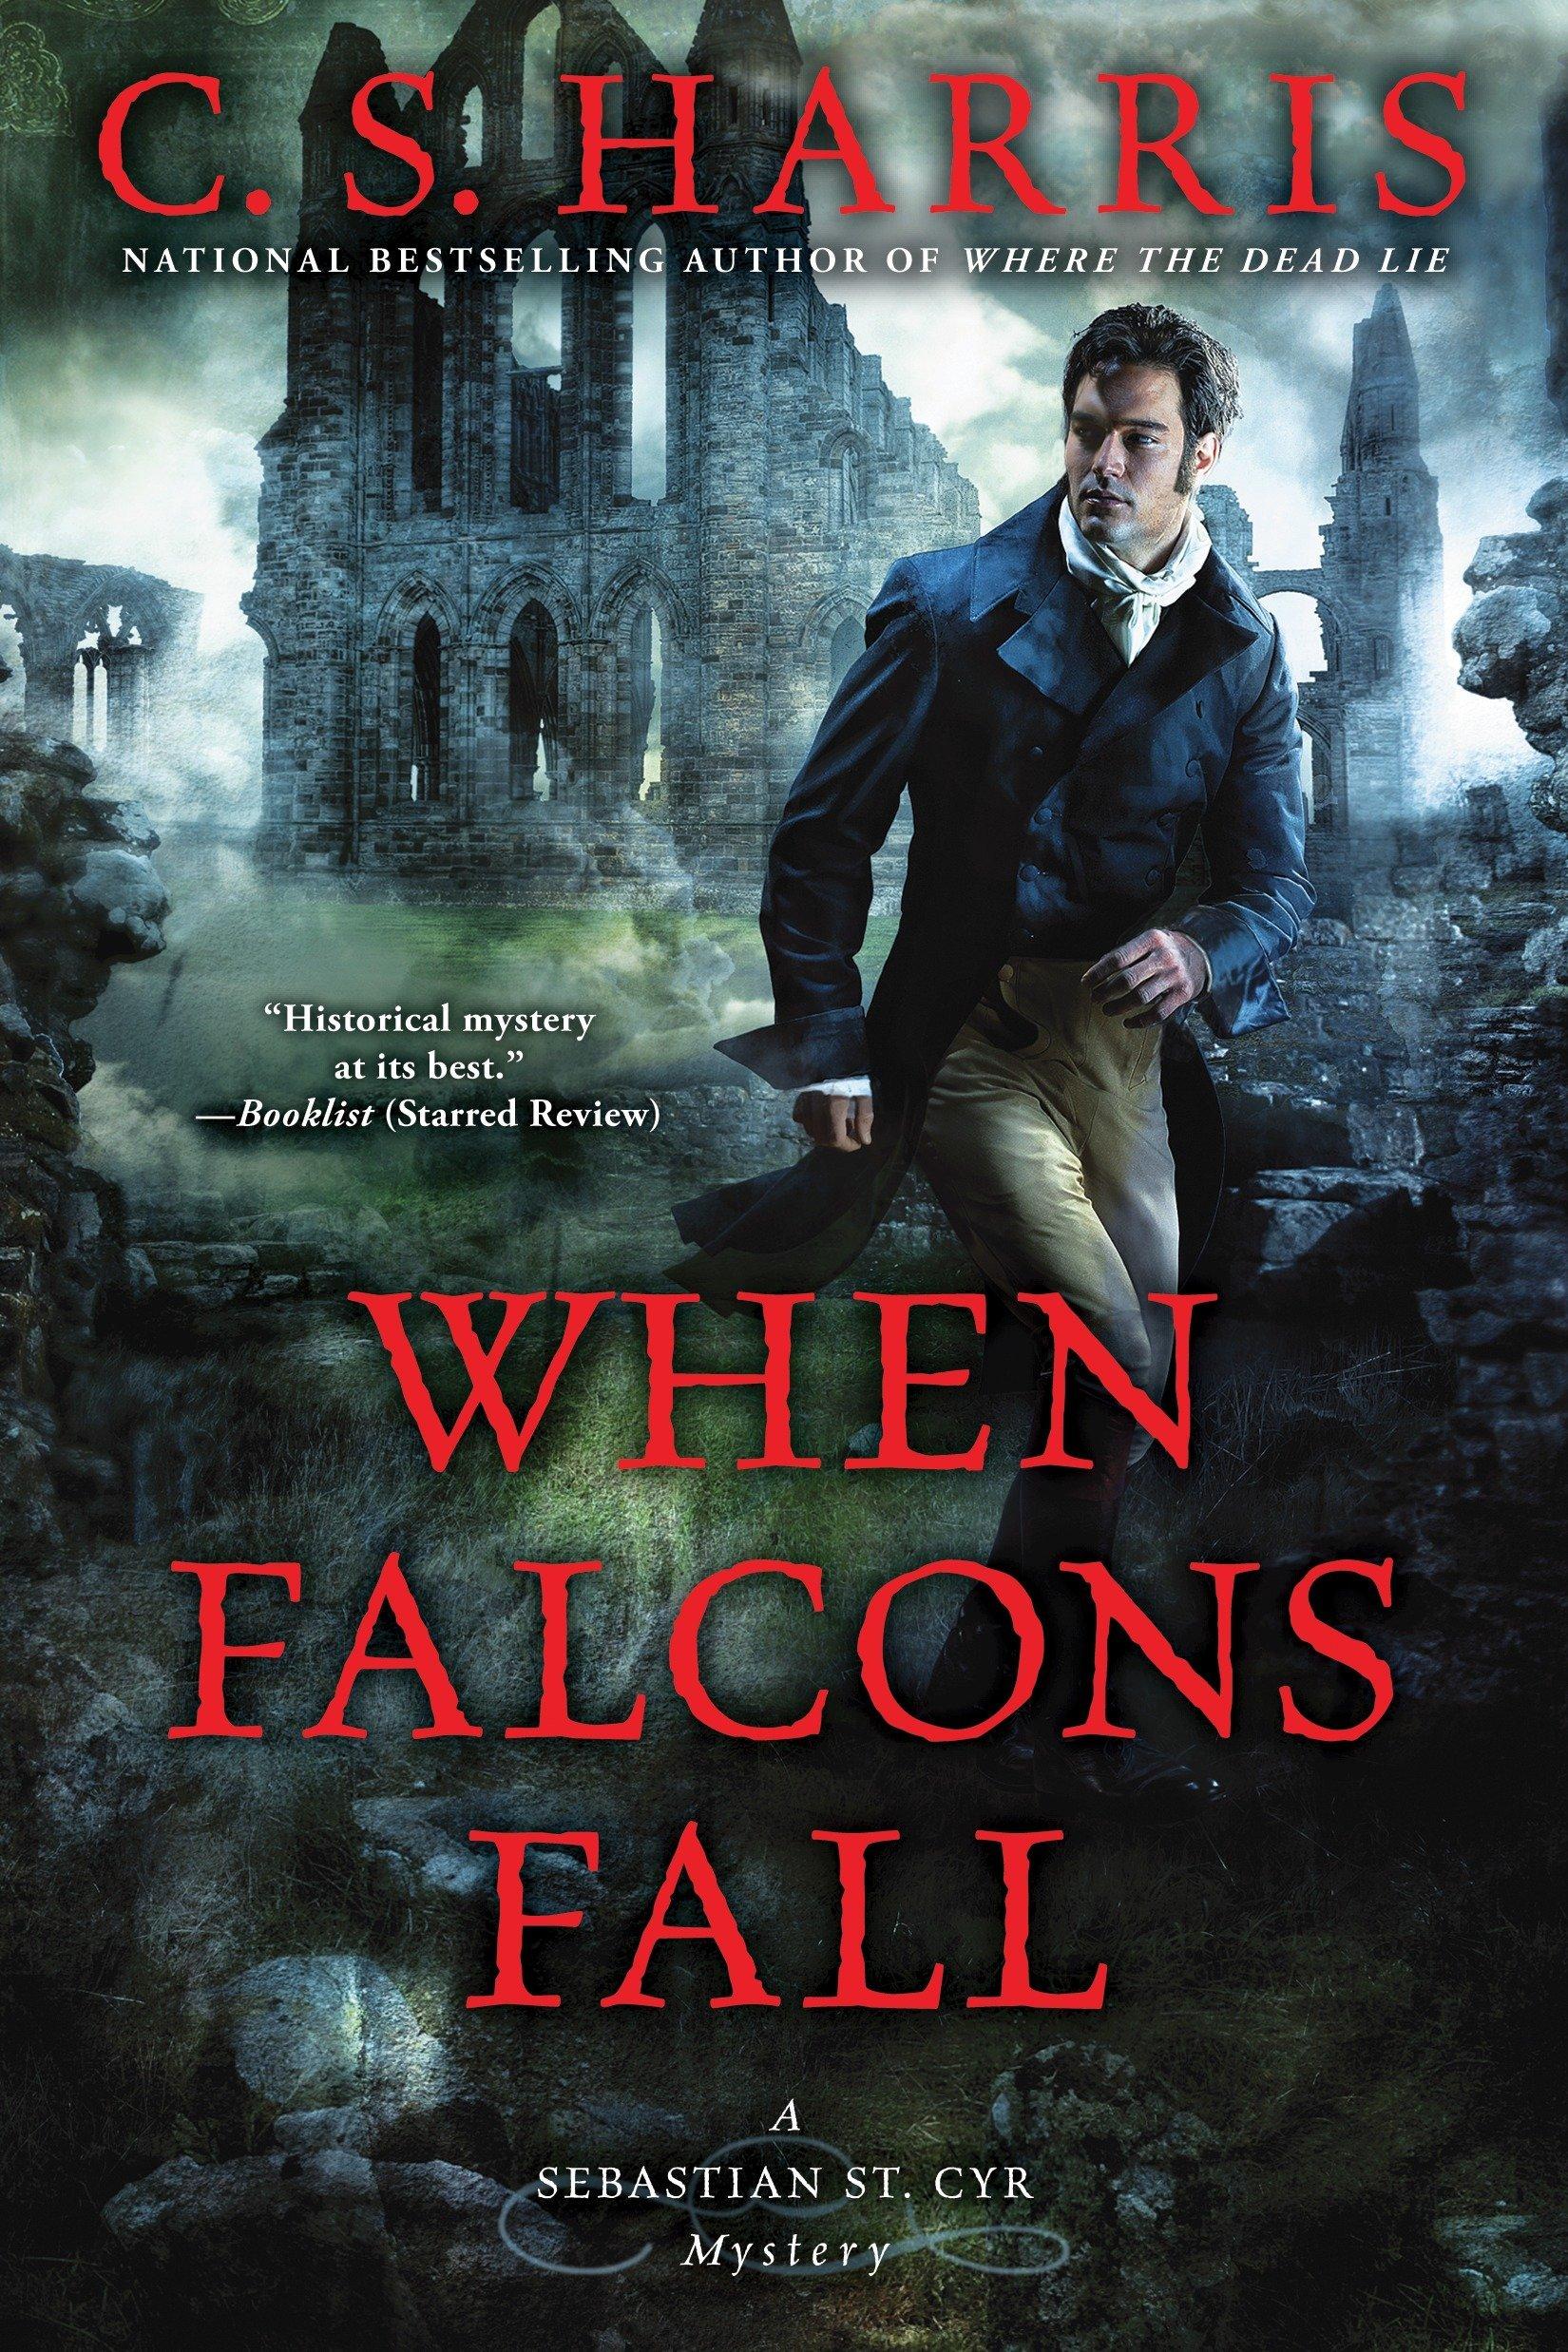 When Falcons Fall (Sebastian St. Cyr Mystery, Band 11)